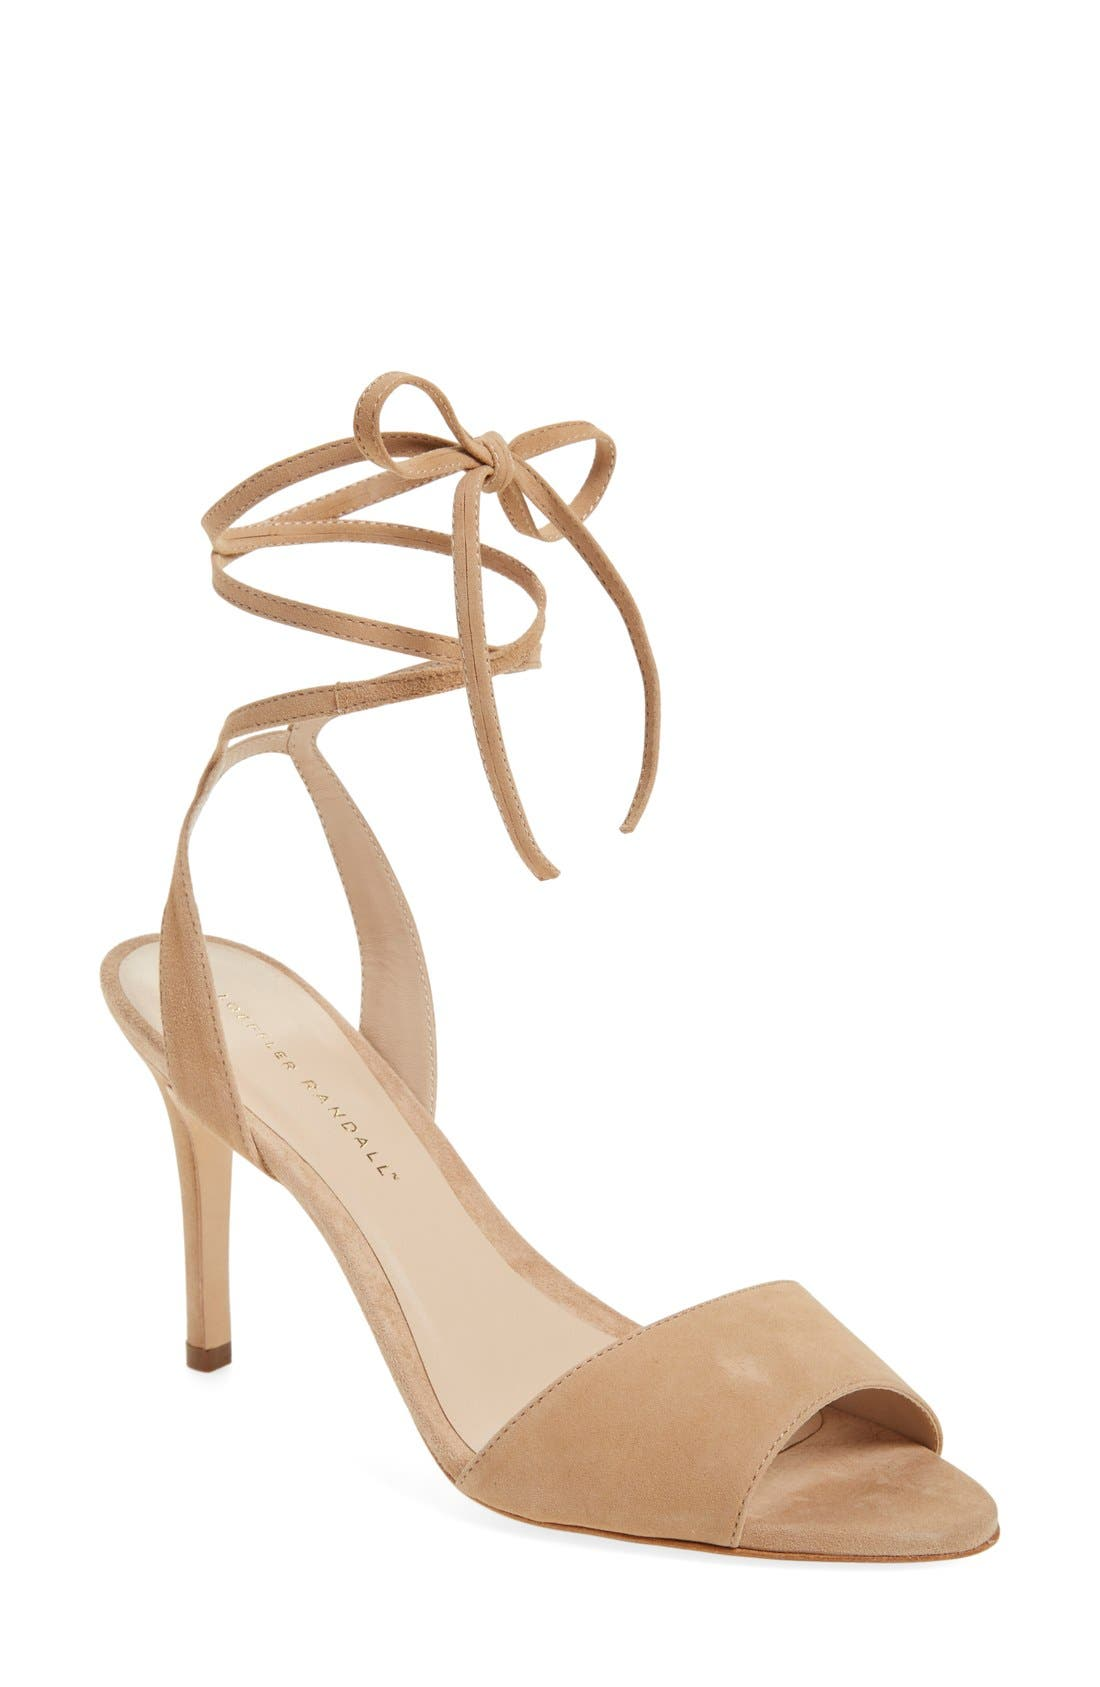 Alternate Image 1 Selected - Loeffler Randall 'Elyse' Lace-Up Sandal (Women)